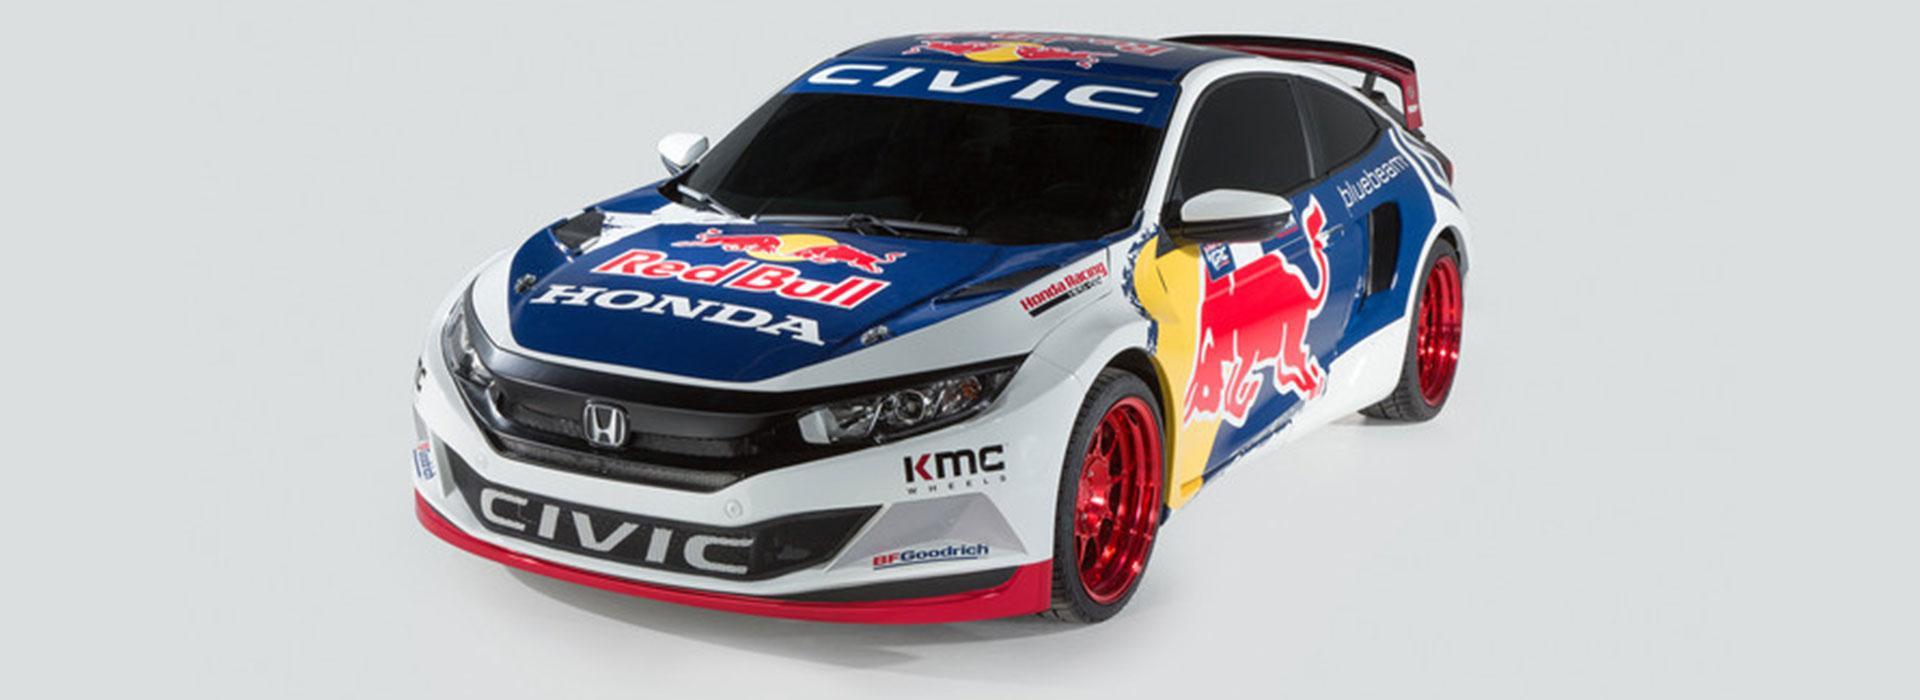 The Red Bull Rallycross Civic